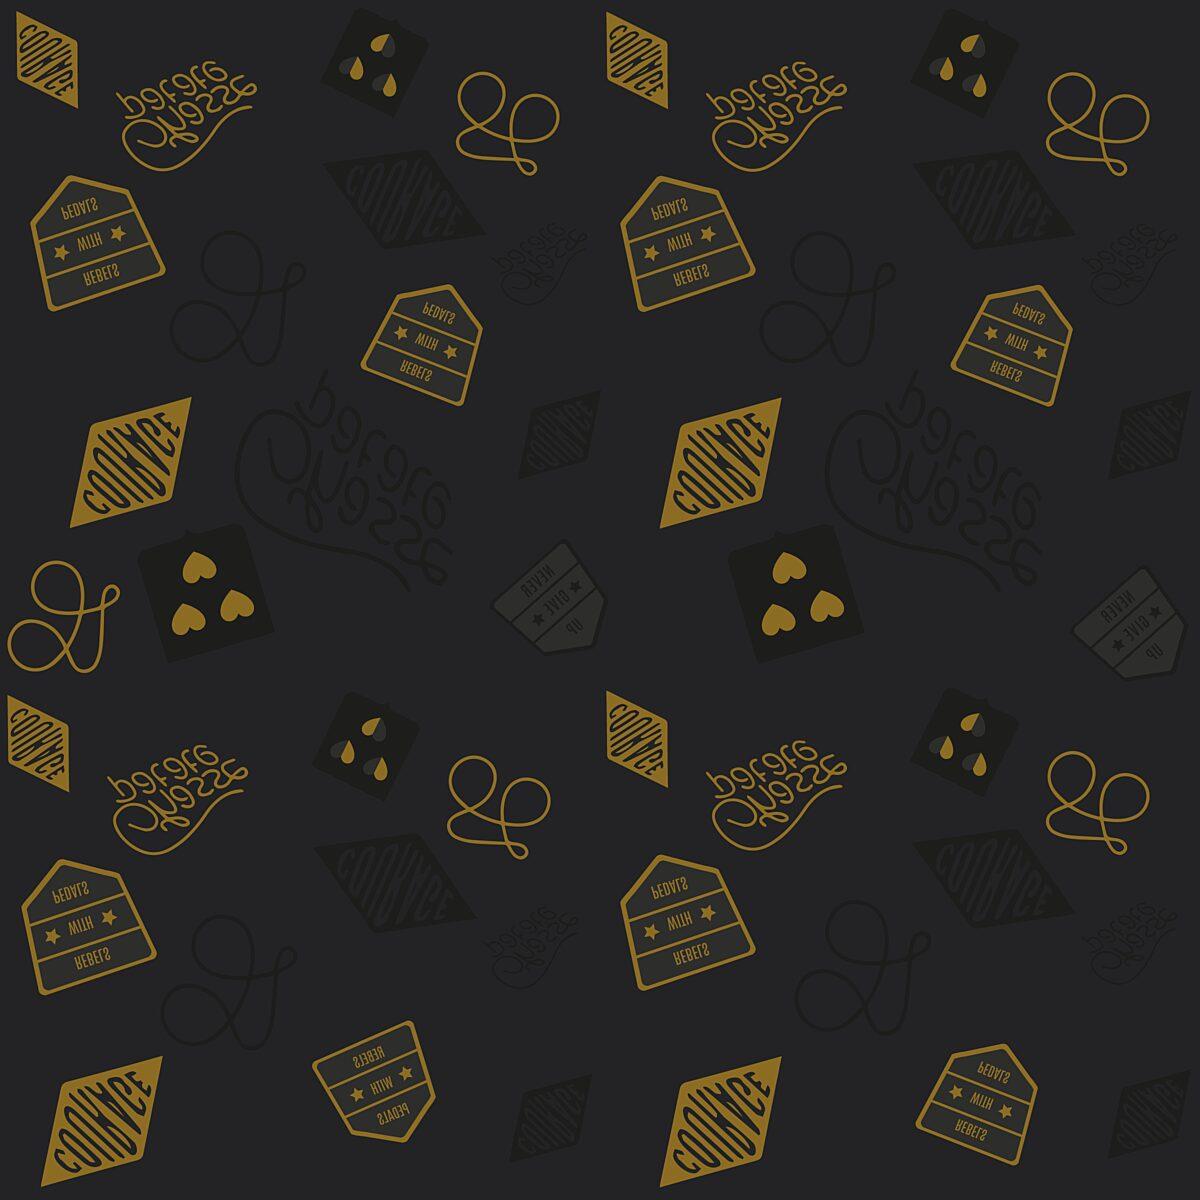 Inspiration jamie vaessen pattern 01